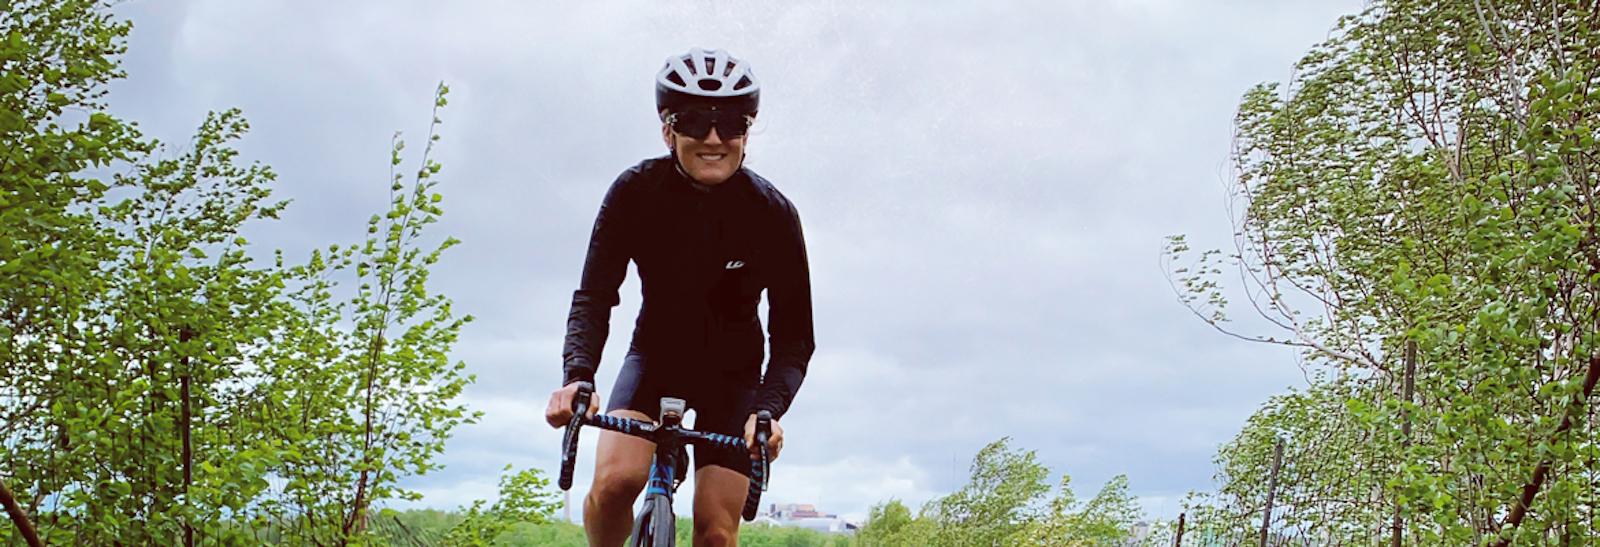 Pro-Cyclist